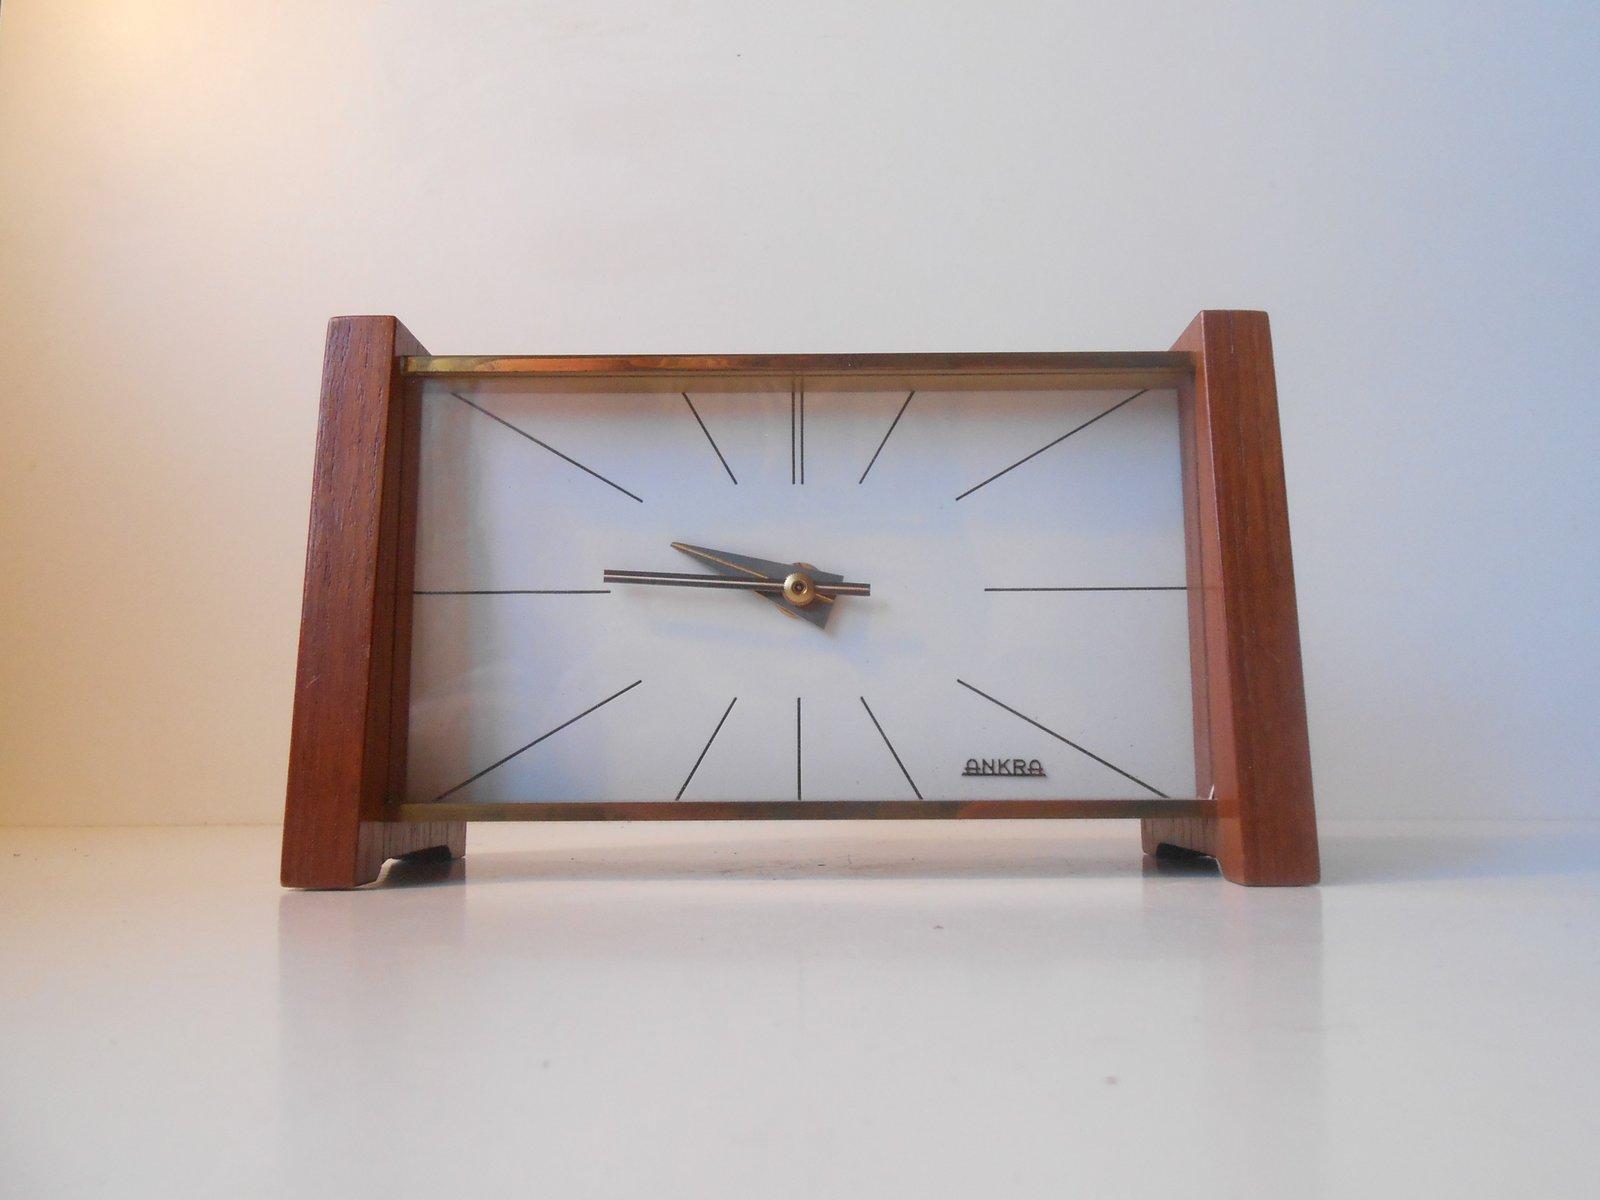 https://cdn10.pamono.com/p/z/1/3/137238_brb12bqwt5/mid-century-modern-table-clock-from-ankra-1.jpg